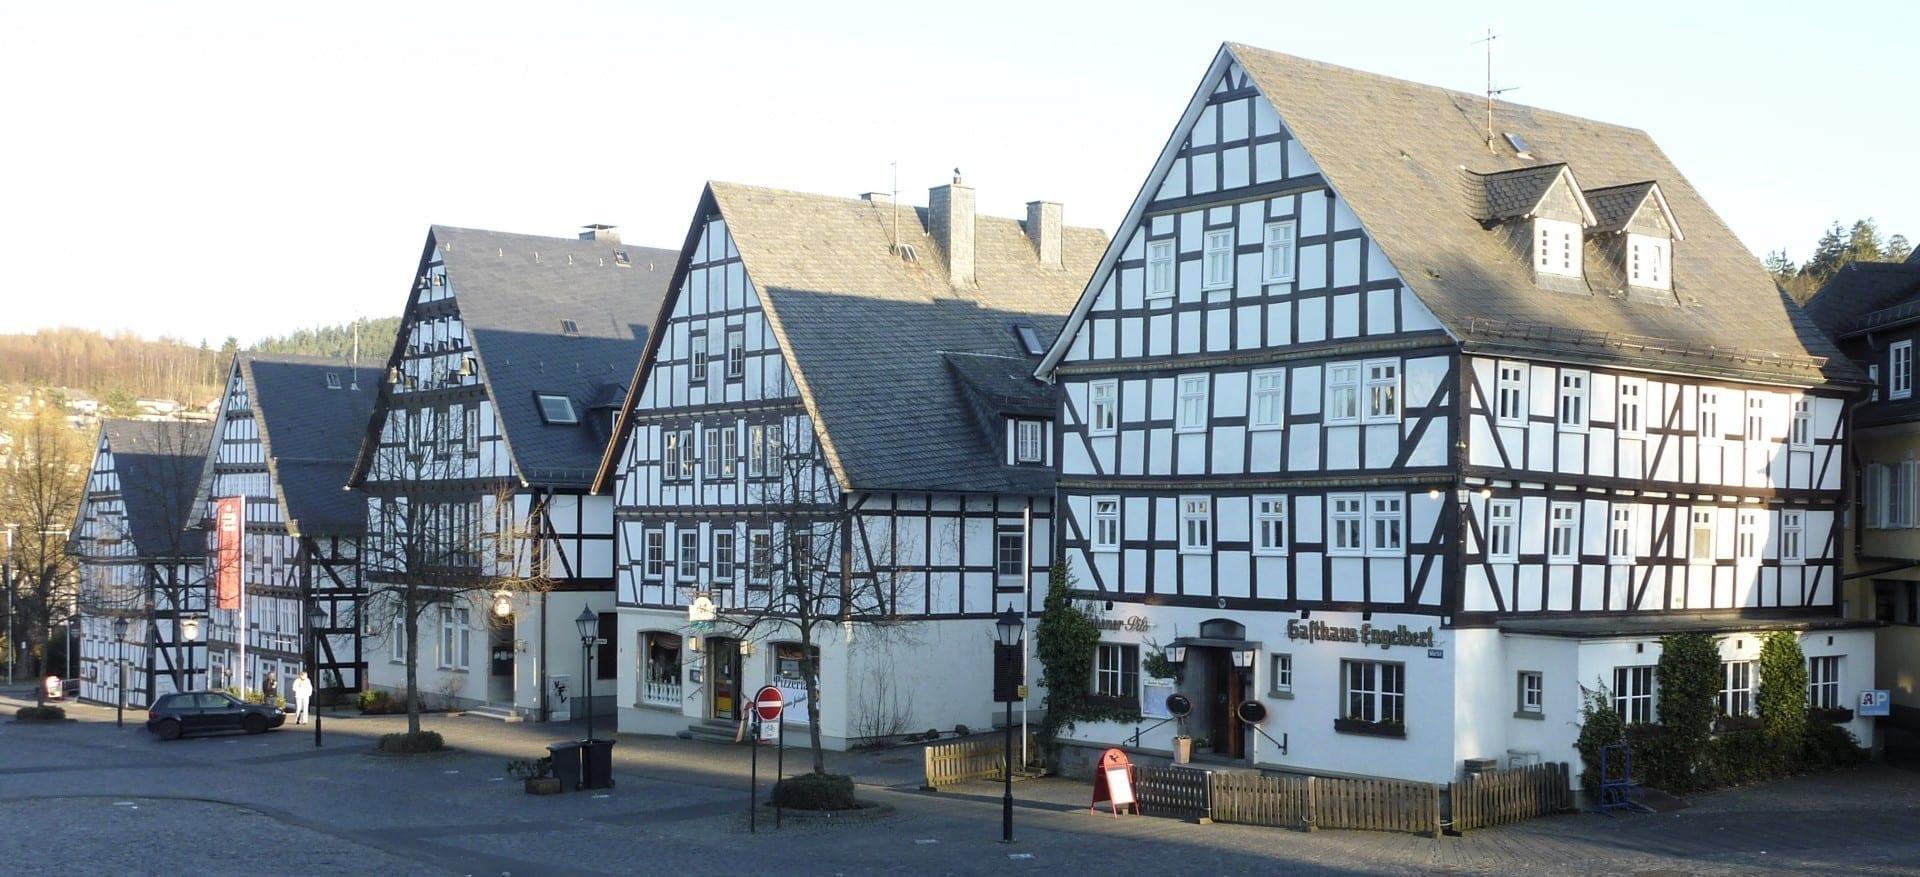 Casas de madera en Hilchenbach Siegen Alemania